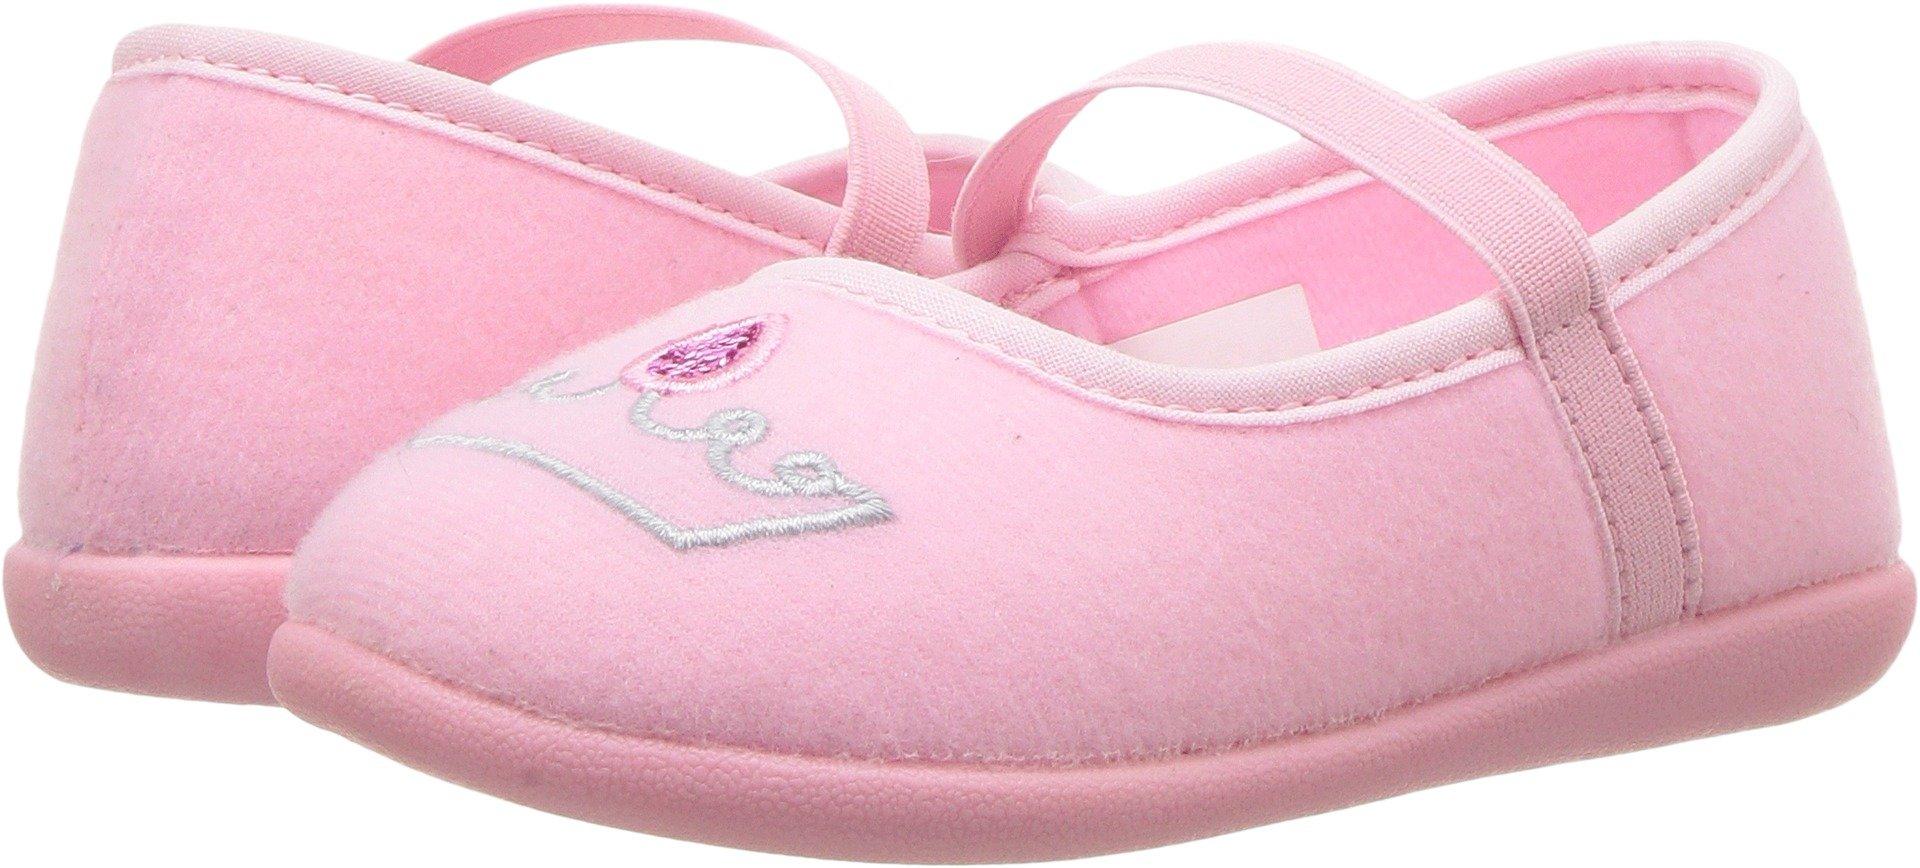 Foamtreads Kids Baby Girl's Crown (Toddler/Little Kid) Pink 11 Little Kid M